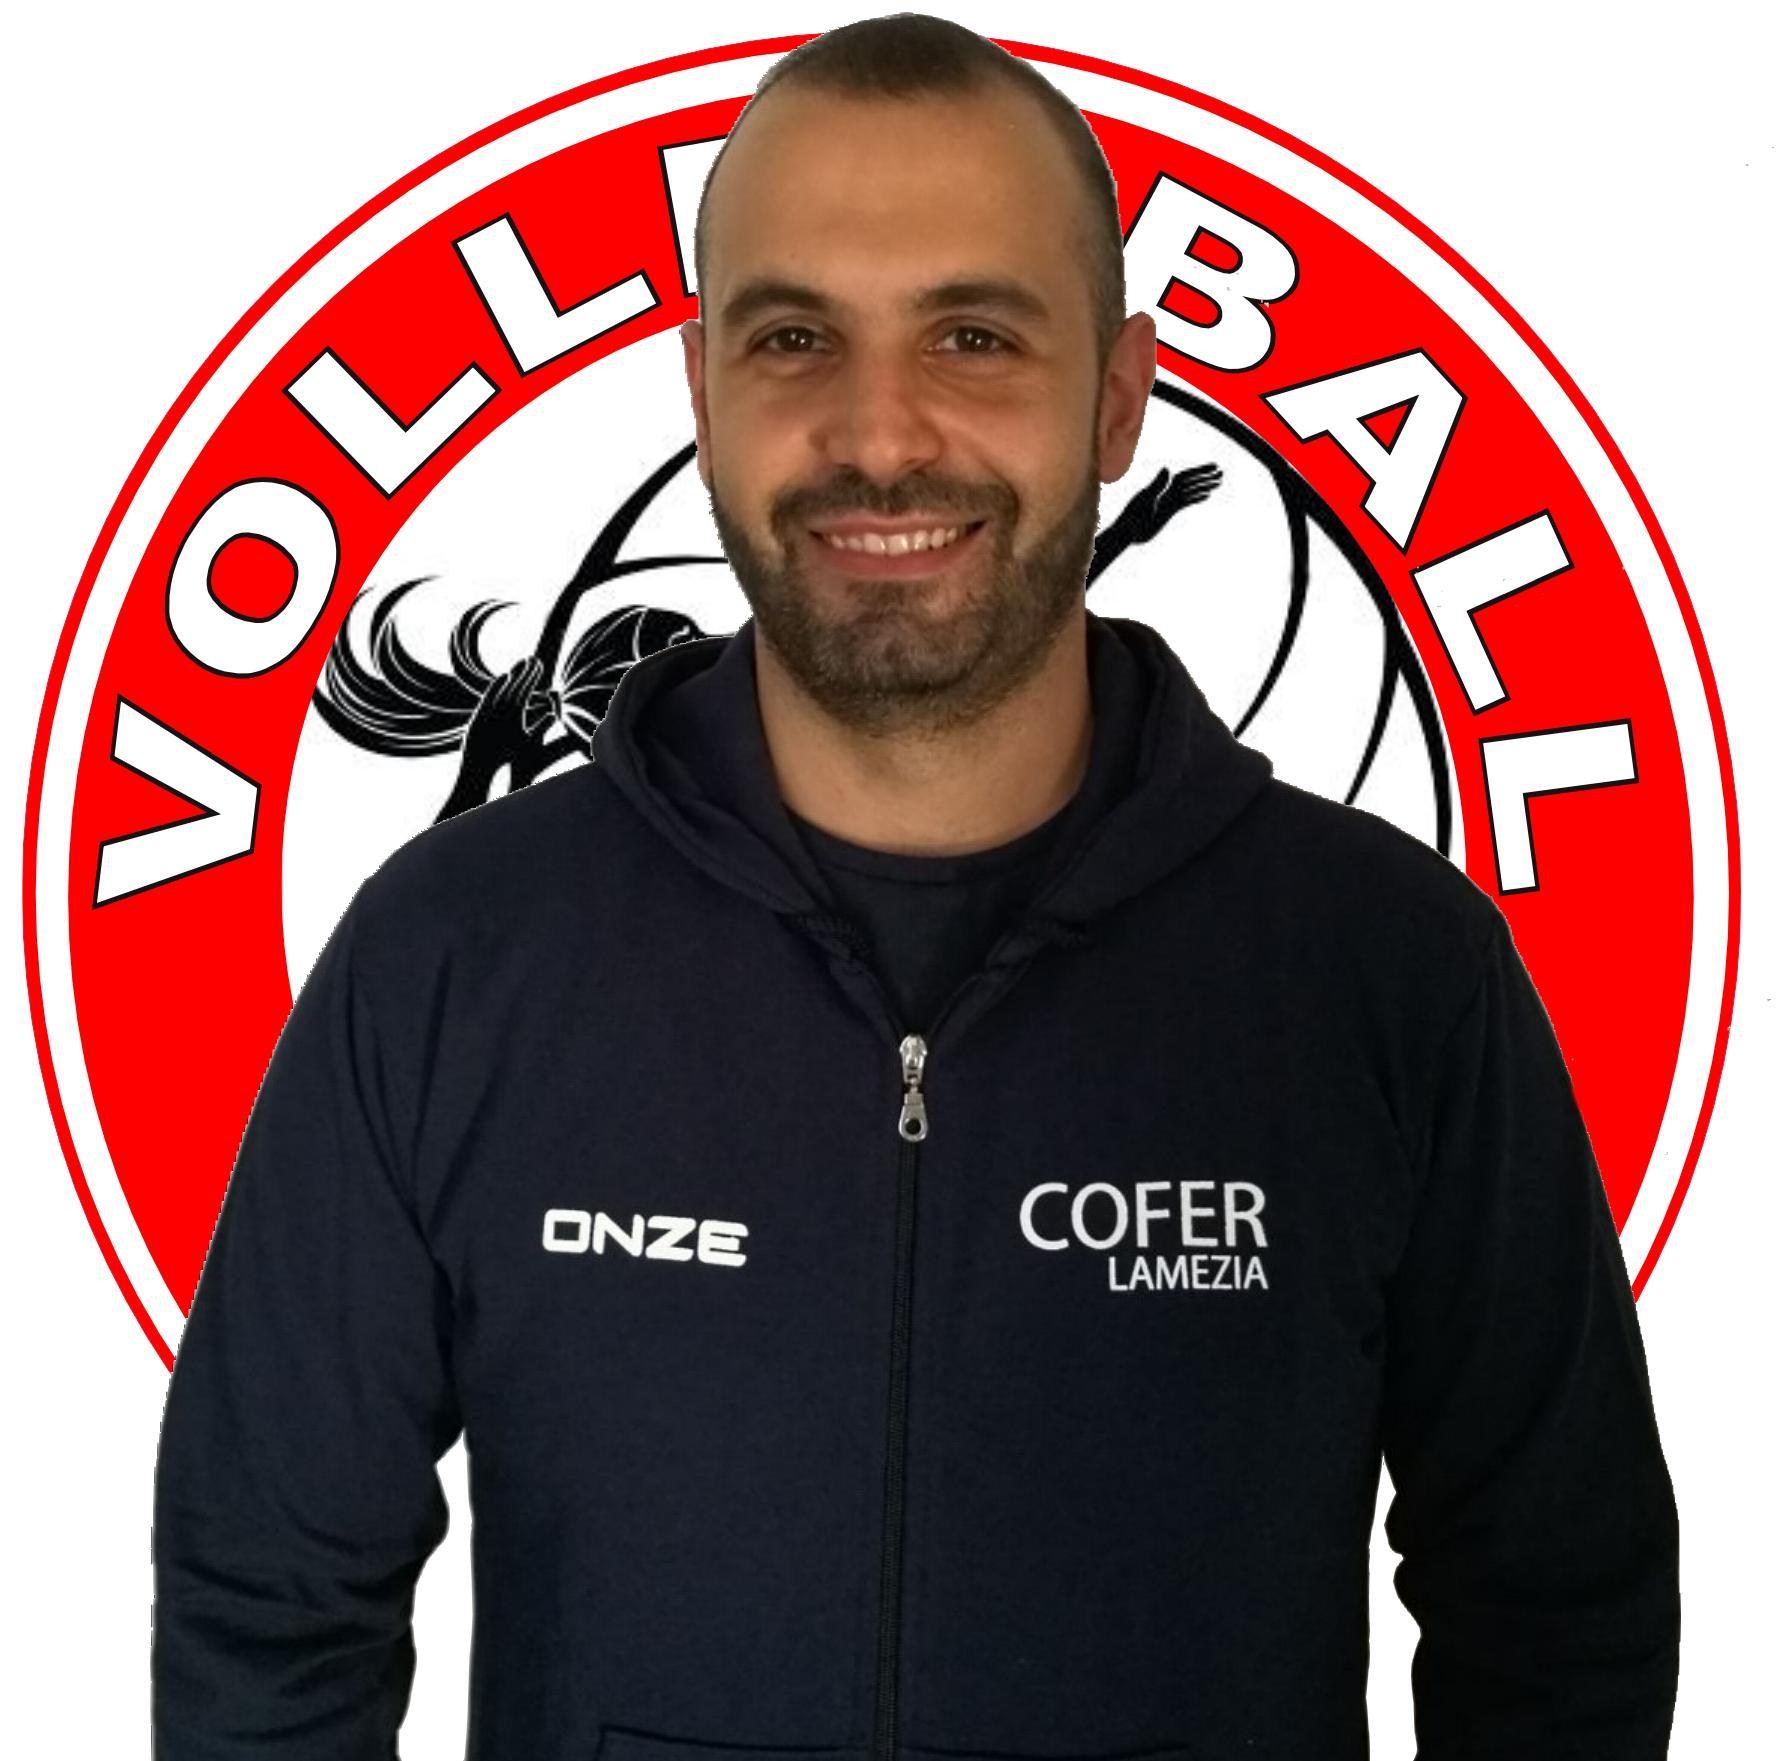 Coach Eliseo, Cofer Lamezia